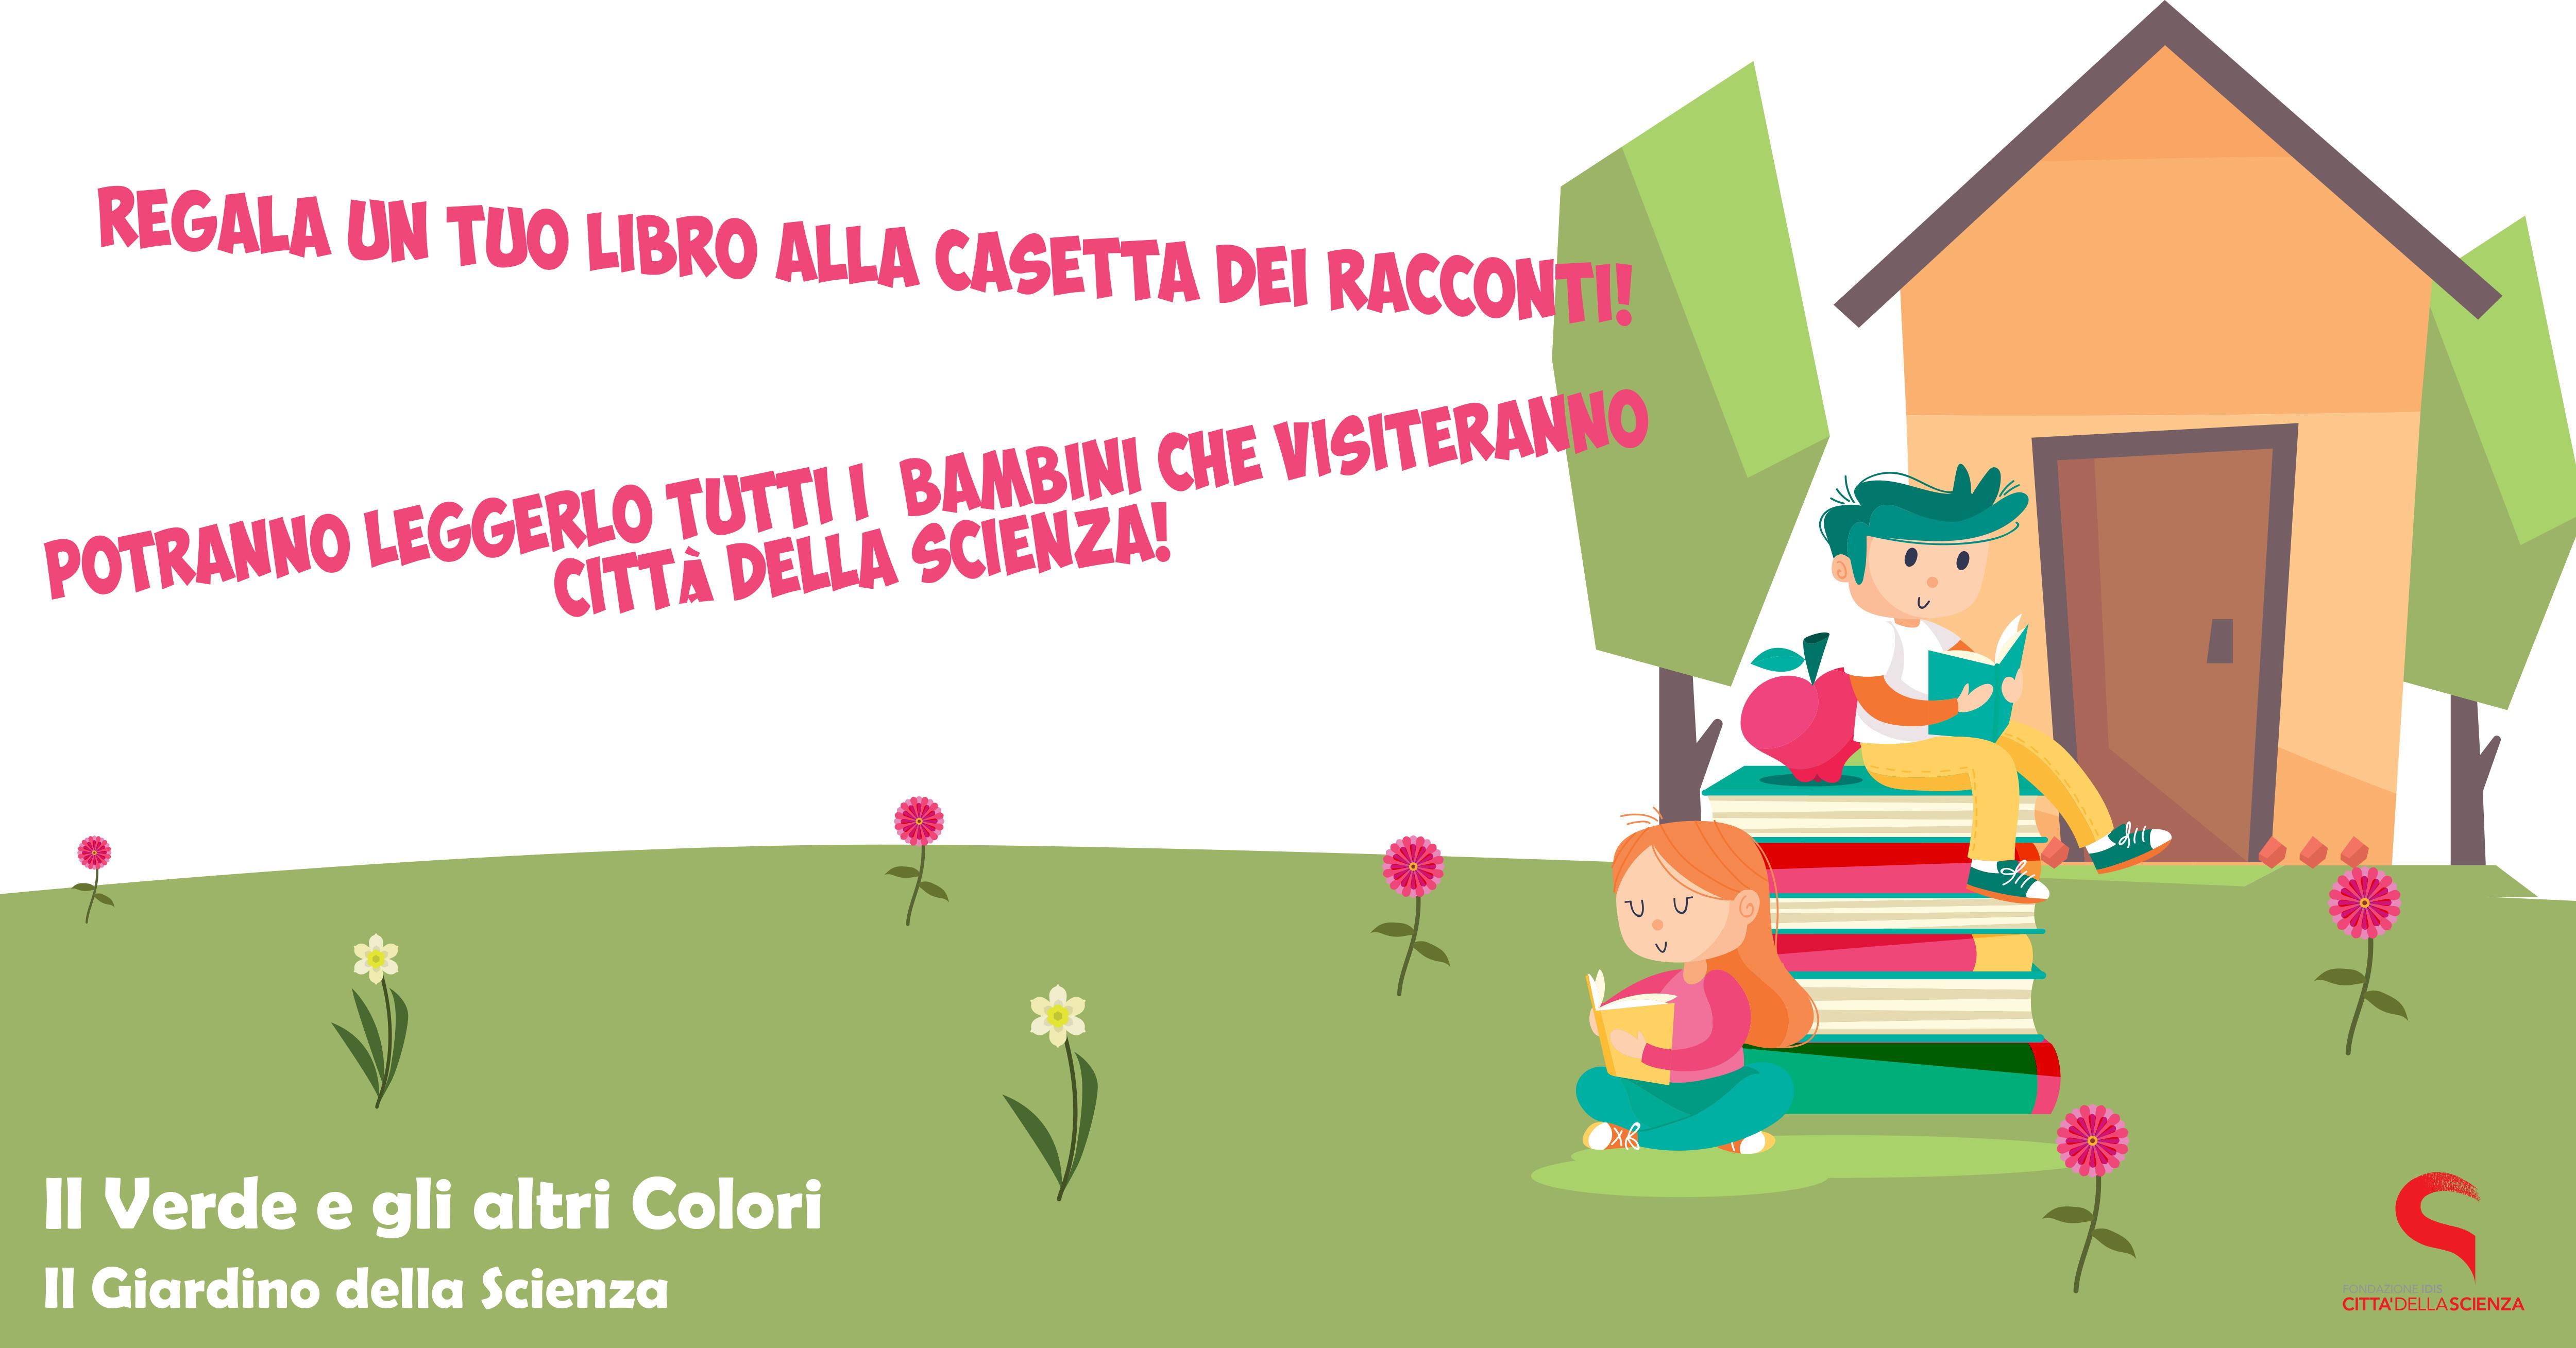 banne_regala_libro